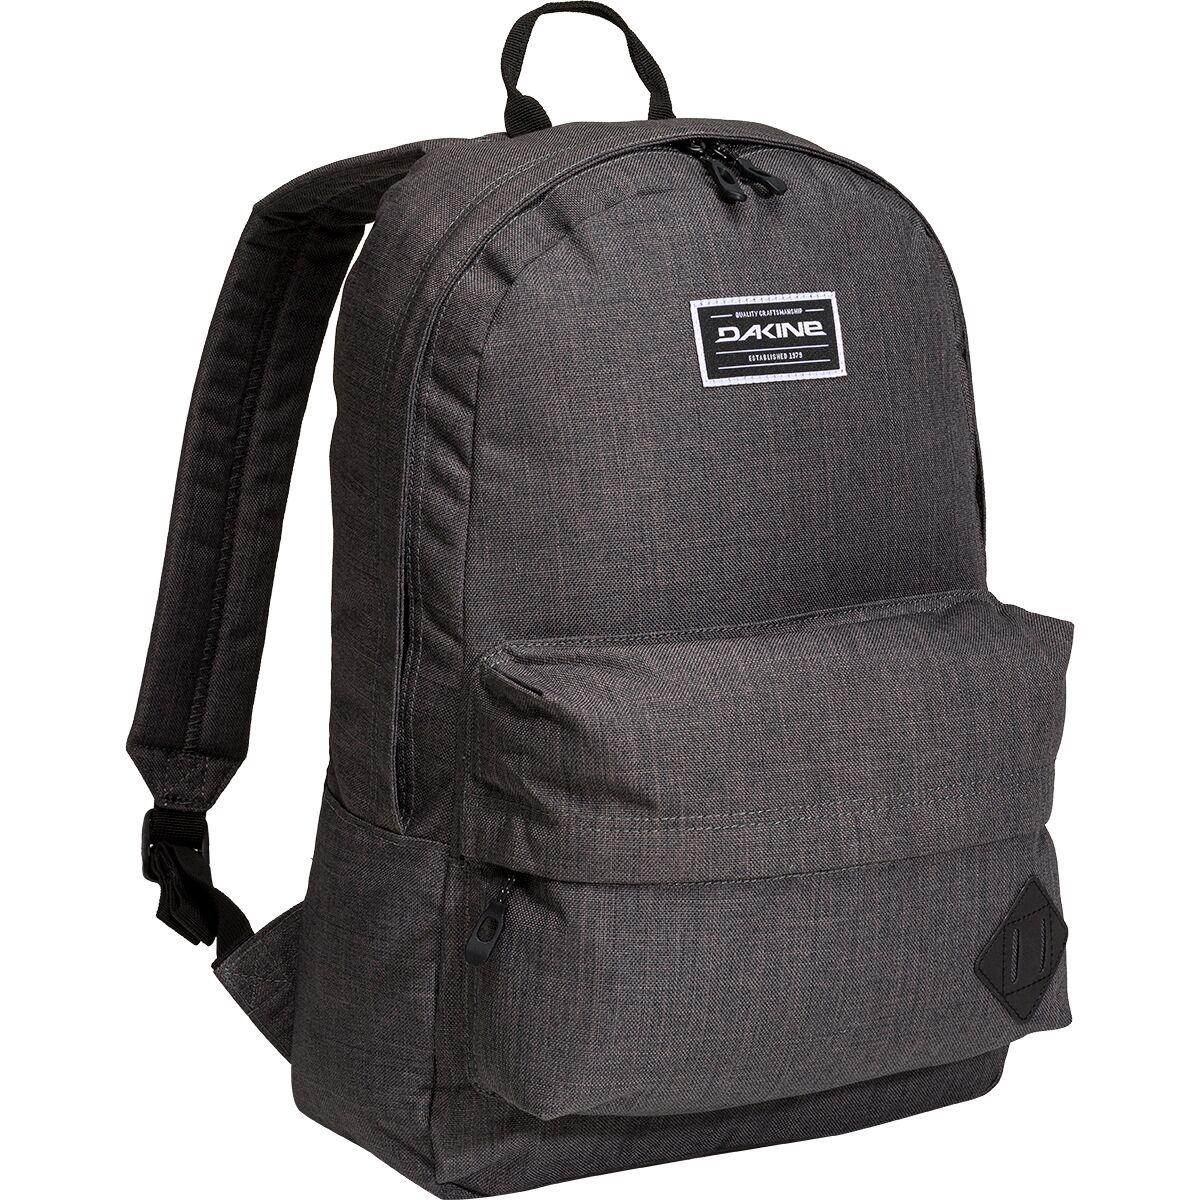 DAKINE 365 Pack DLX 27L Backpack Black, One Size